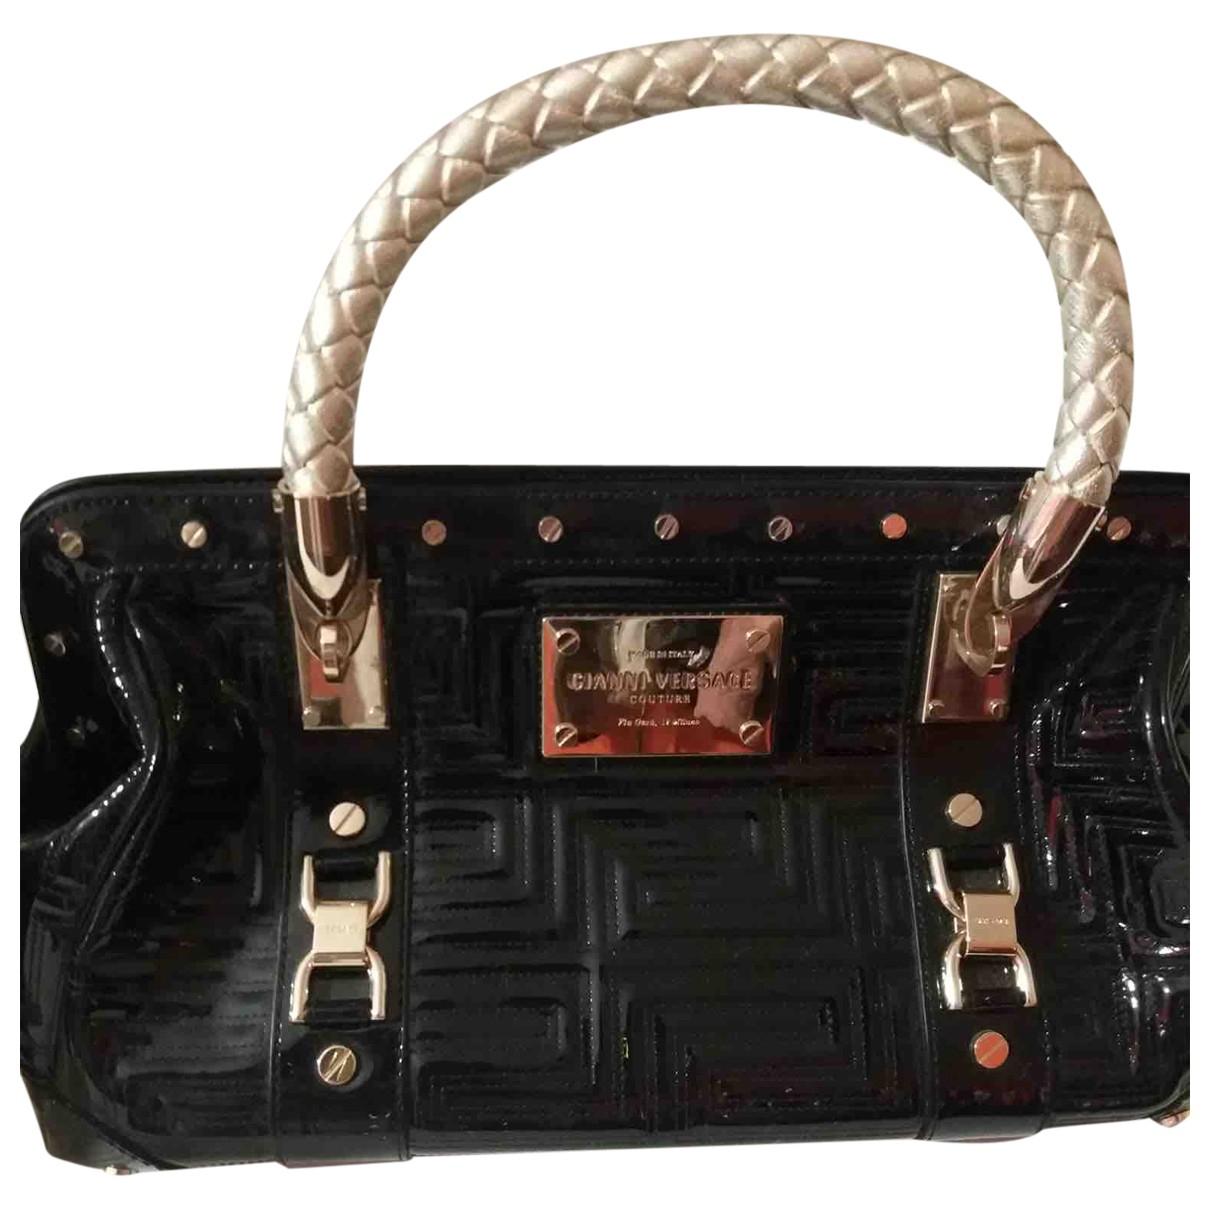 Versace \N Handtasche in  Schwarz Lackleder